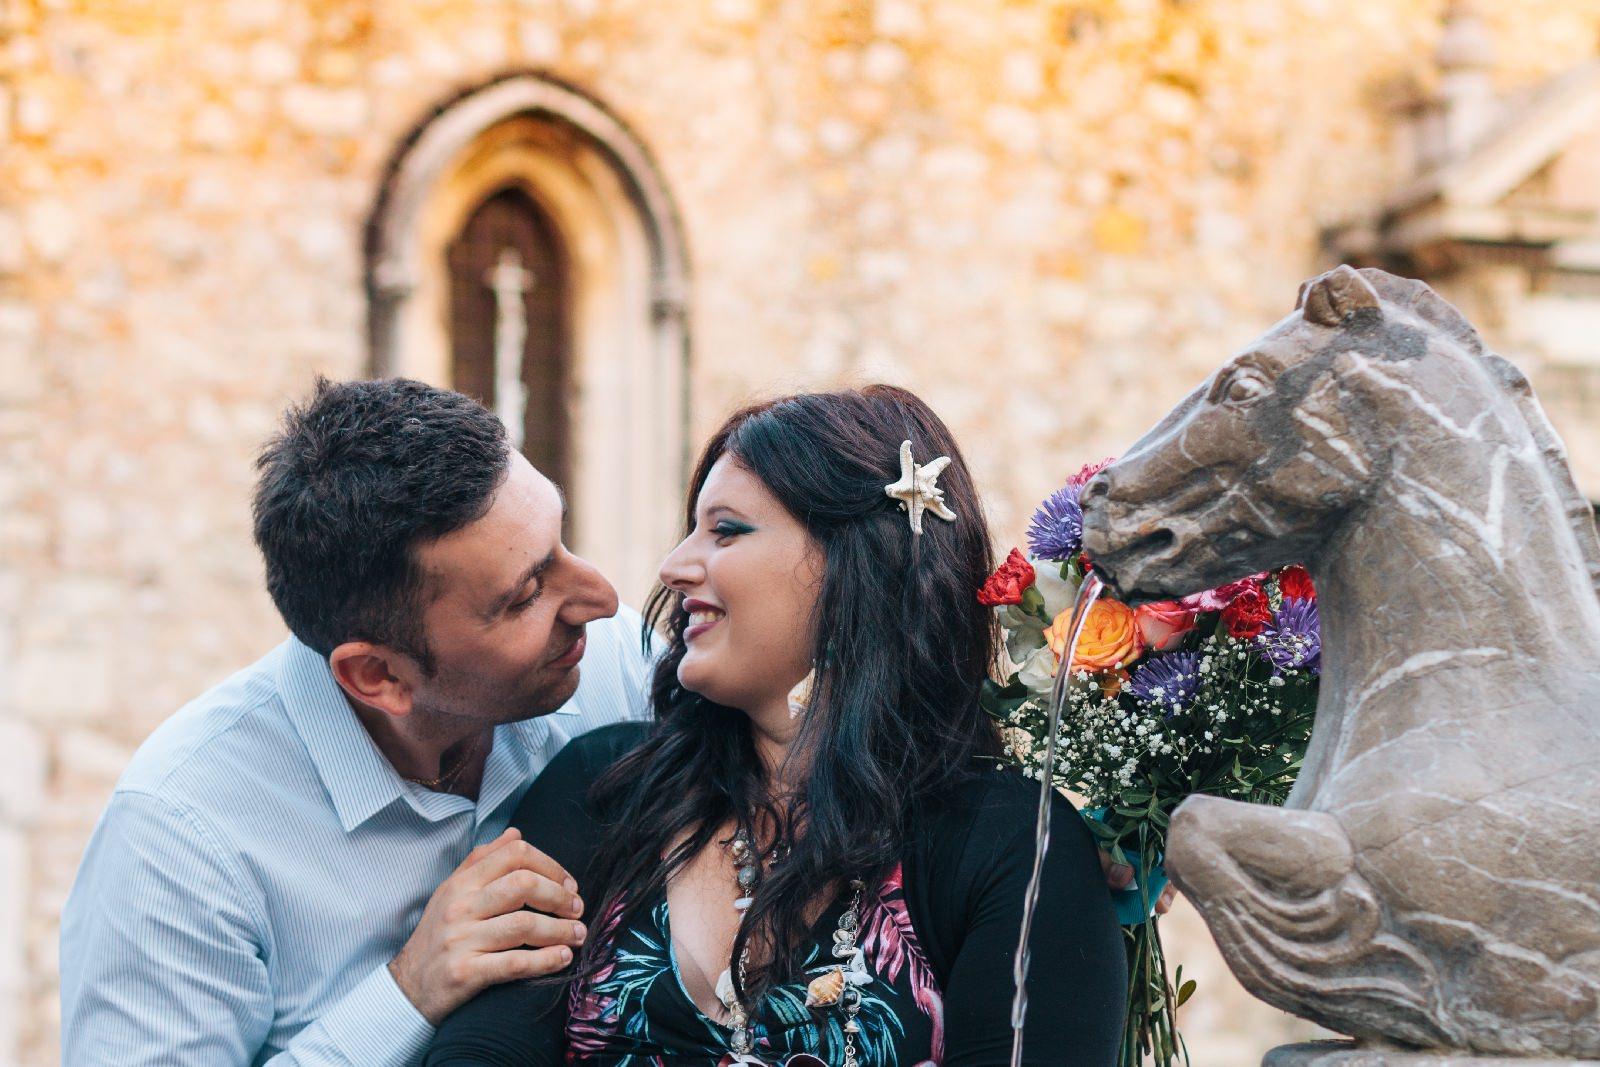 010-2018-09-22-Engagement-Alessandra-e-Igor-Pizzone-007